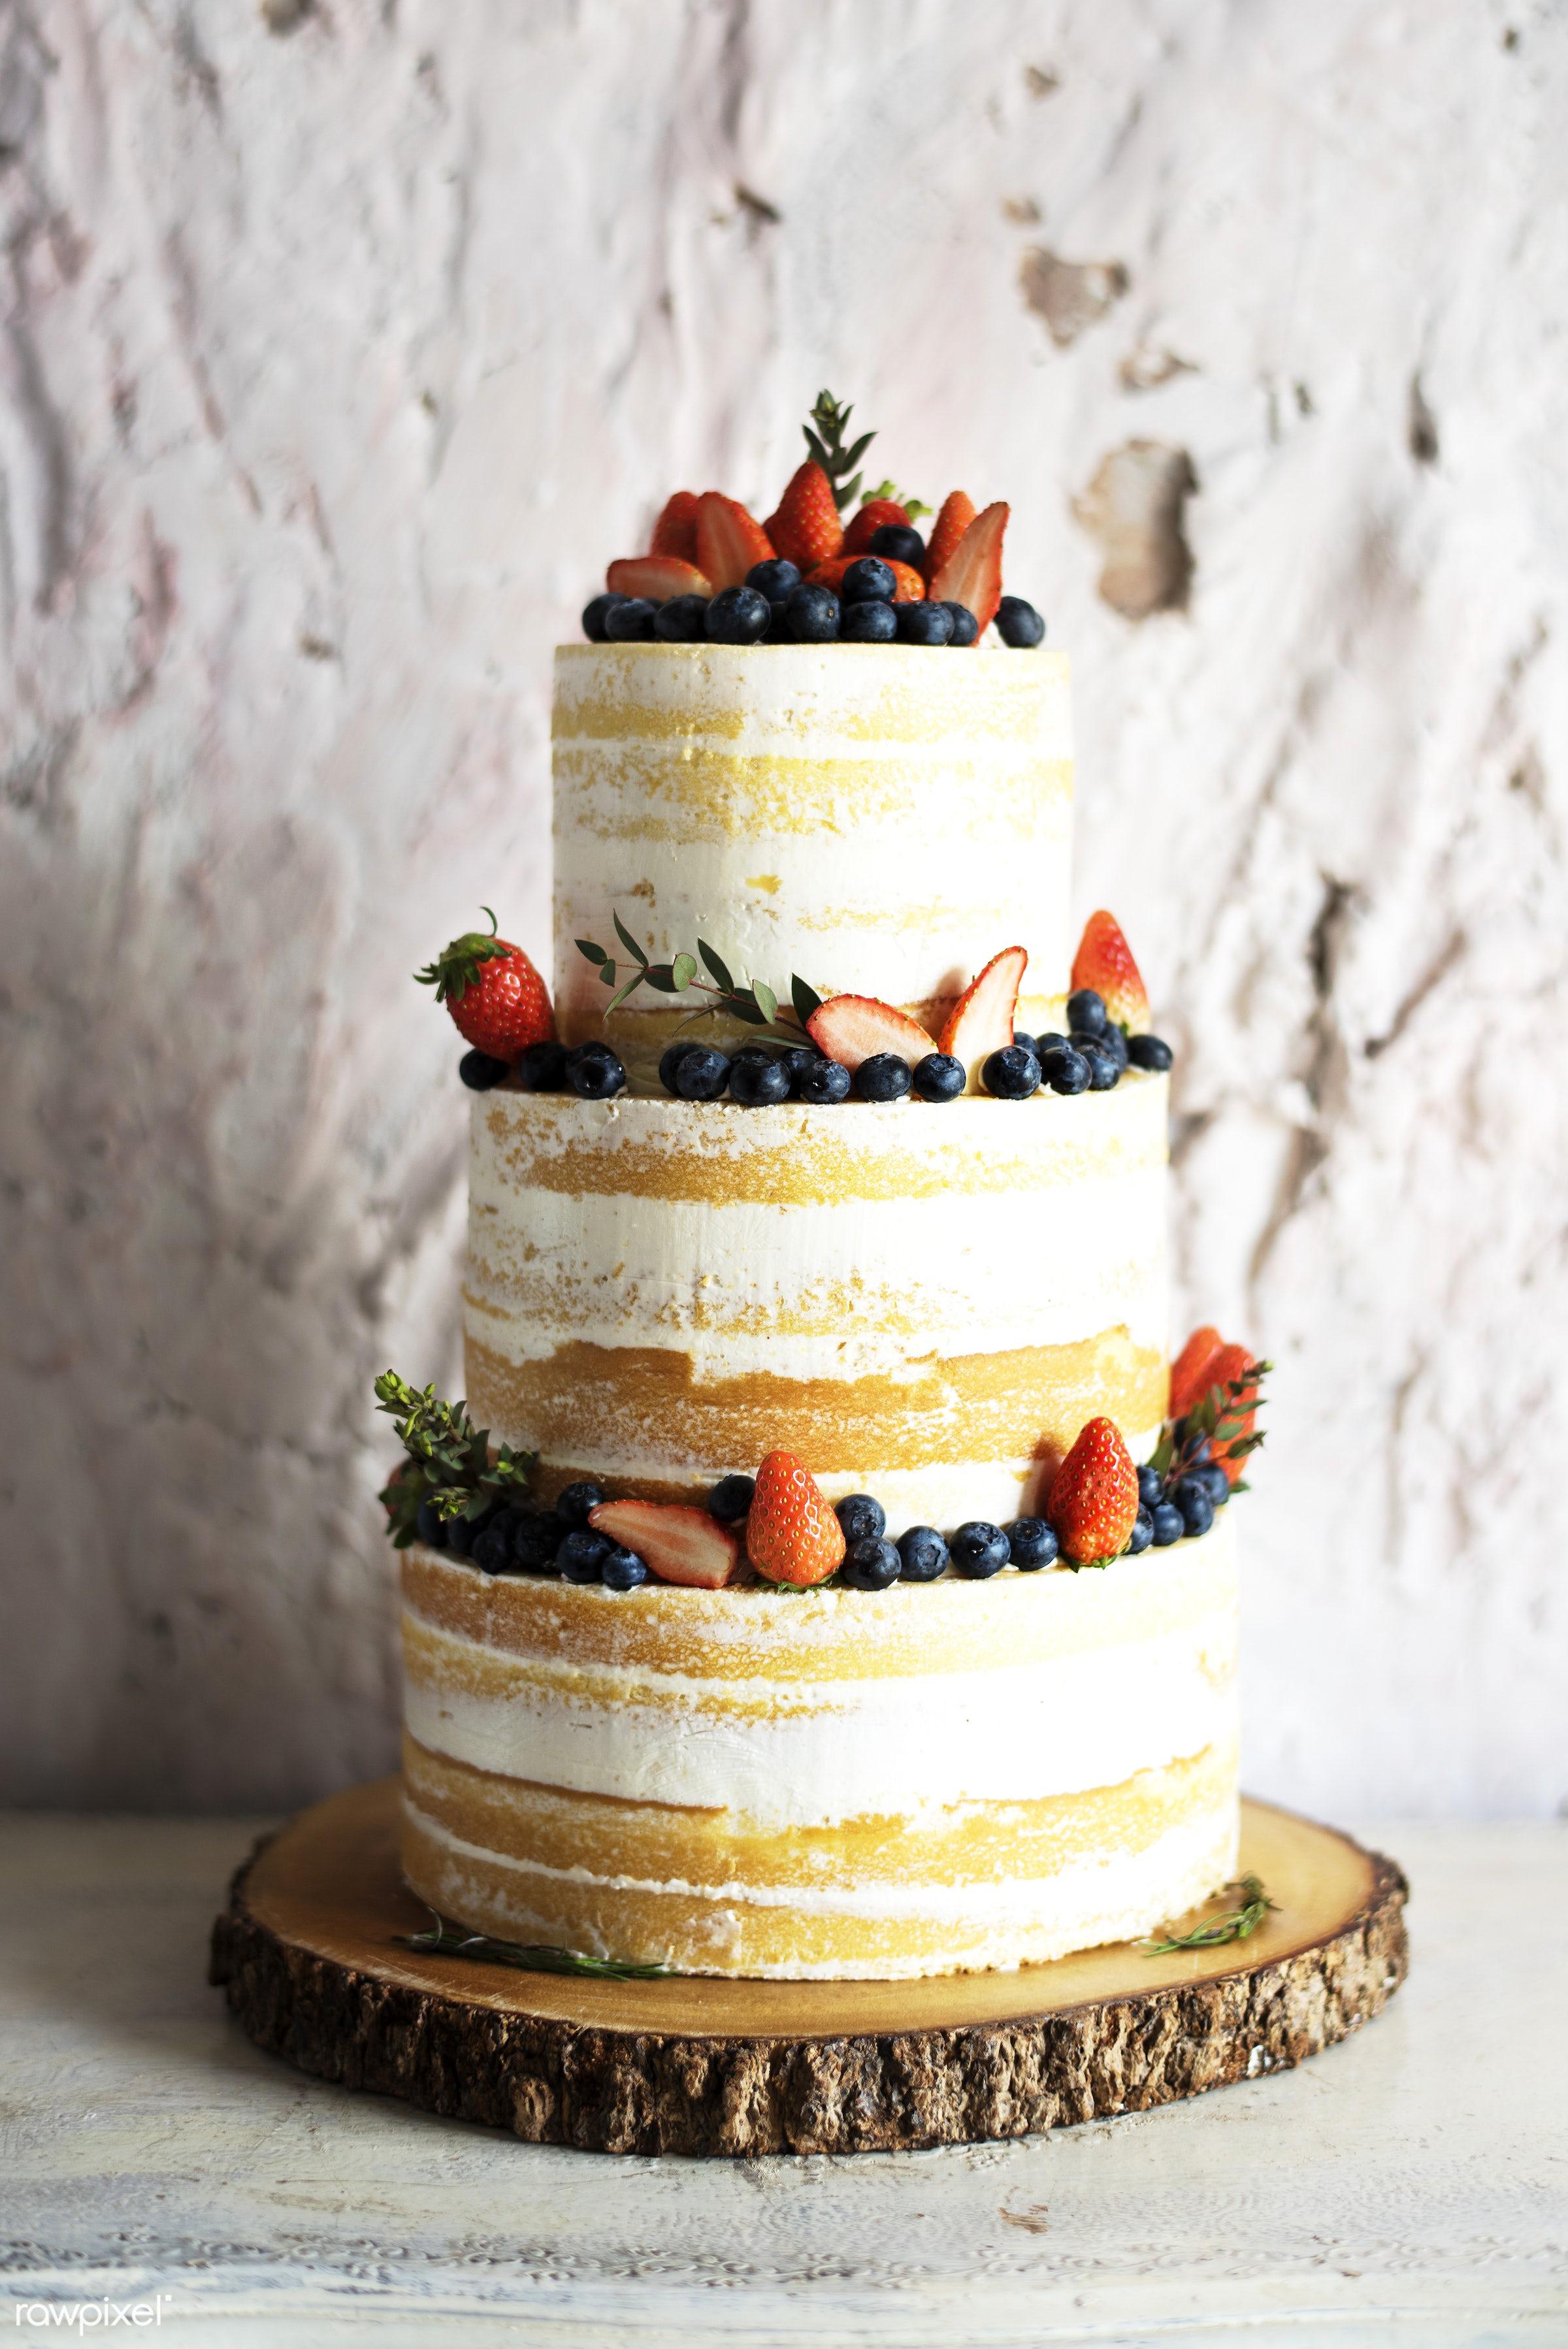 cake, wedding, banquet, bakery, berries, blueberry, celebration, ceremony, decoration, dessert, event, layers, marriage,...